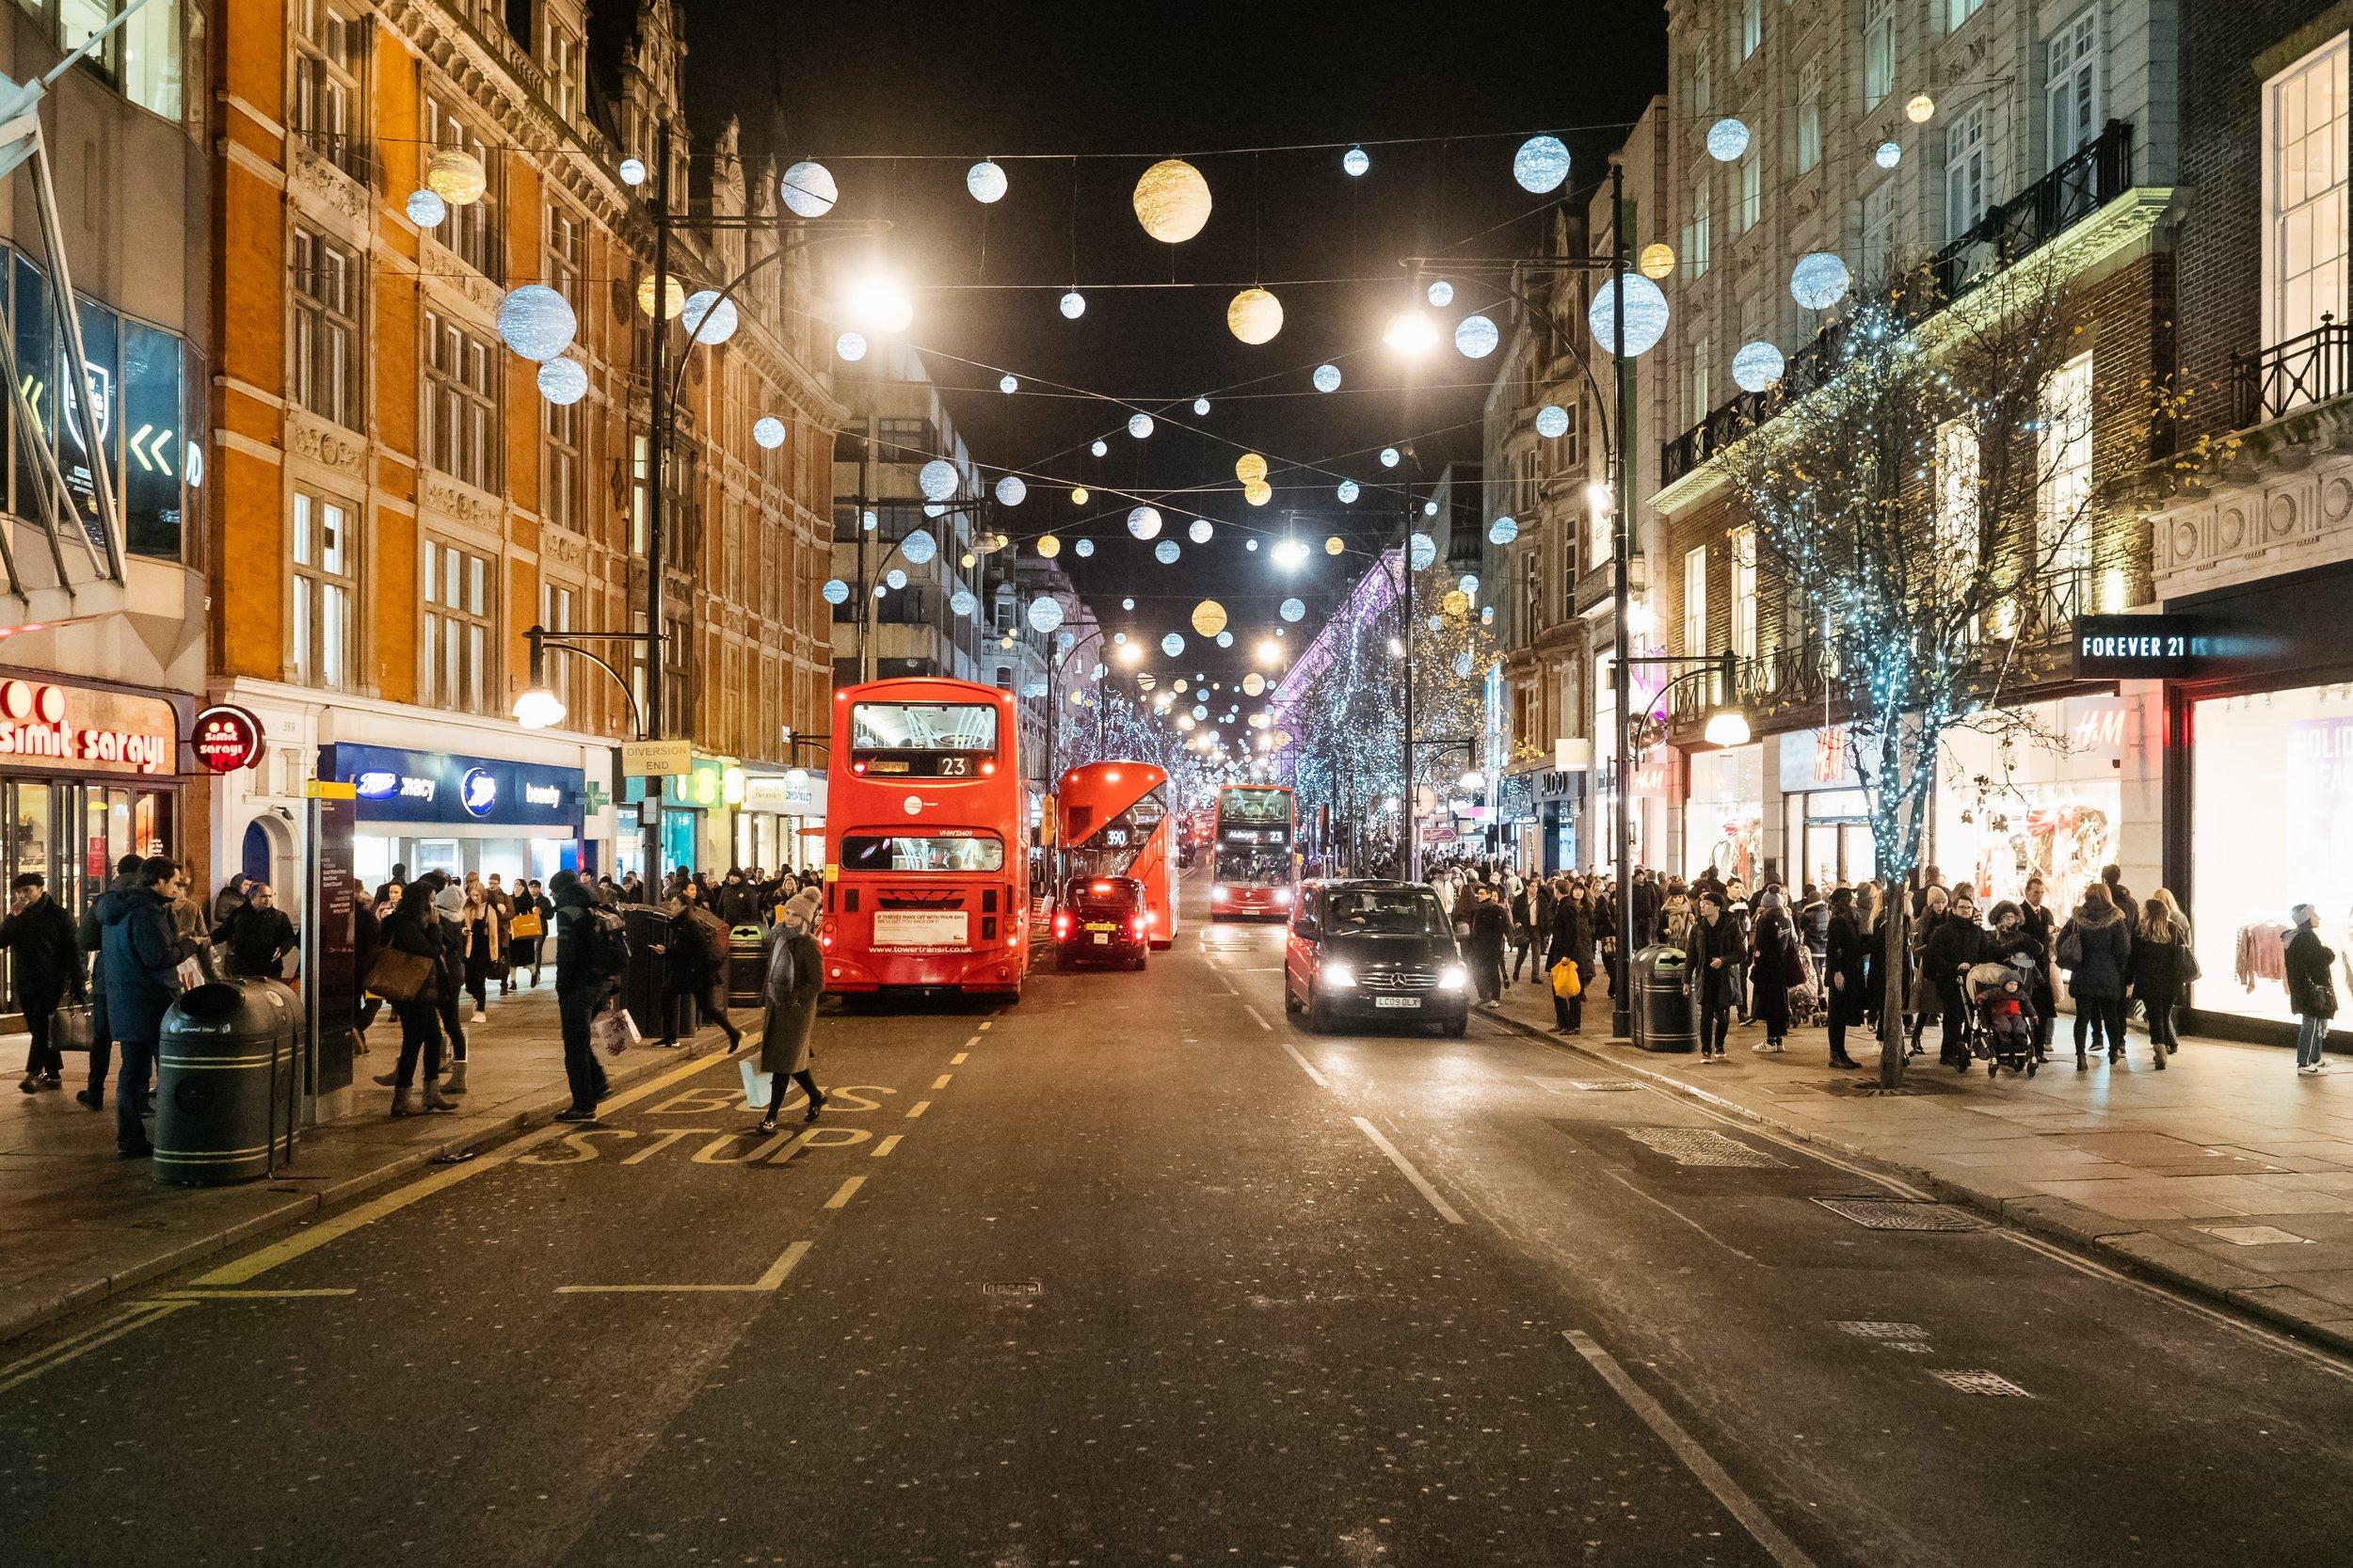 Taken from Bond Street in London, England on December 12.